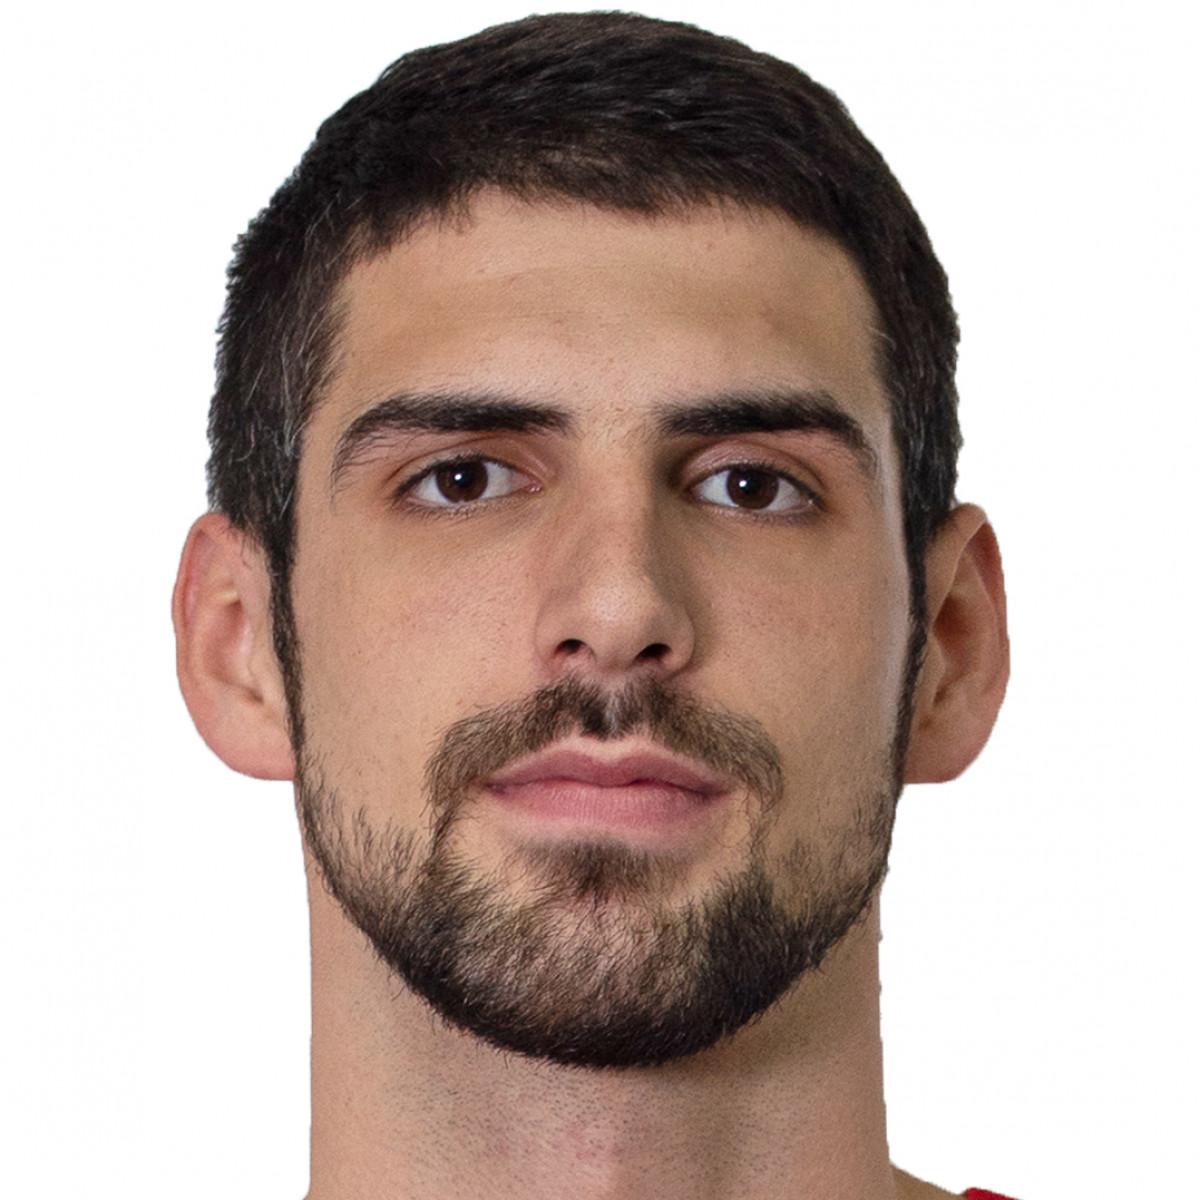 Marko Radovanovic